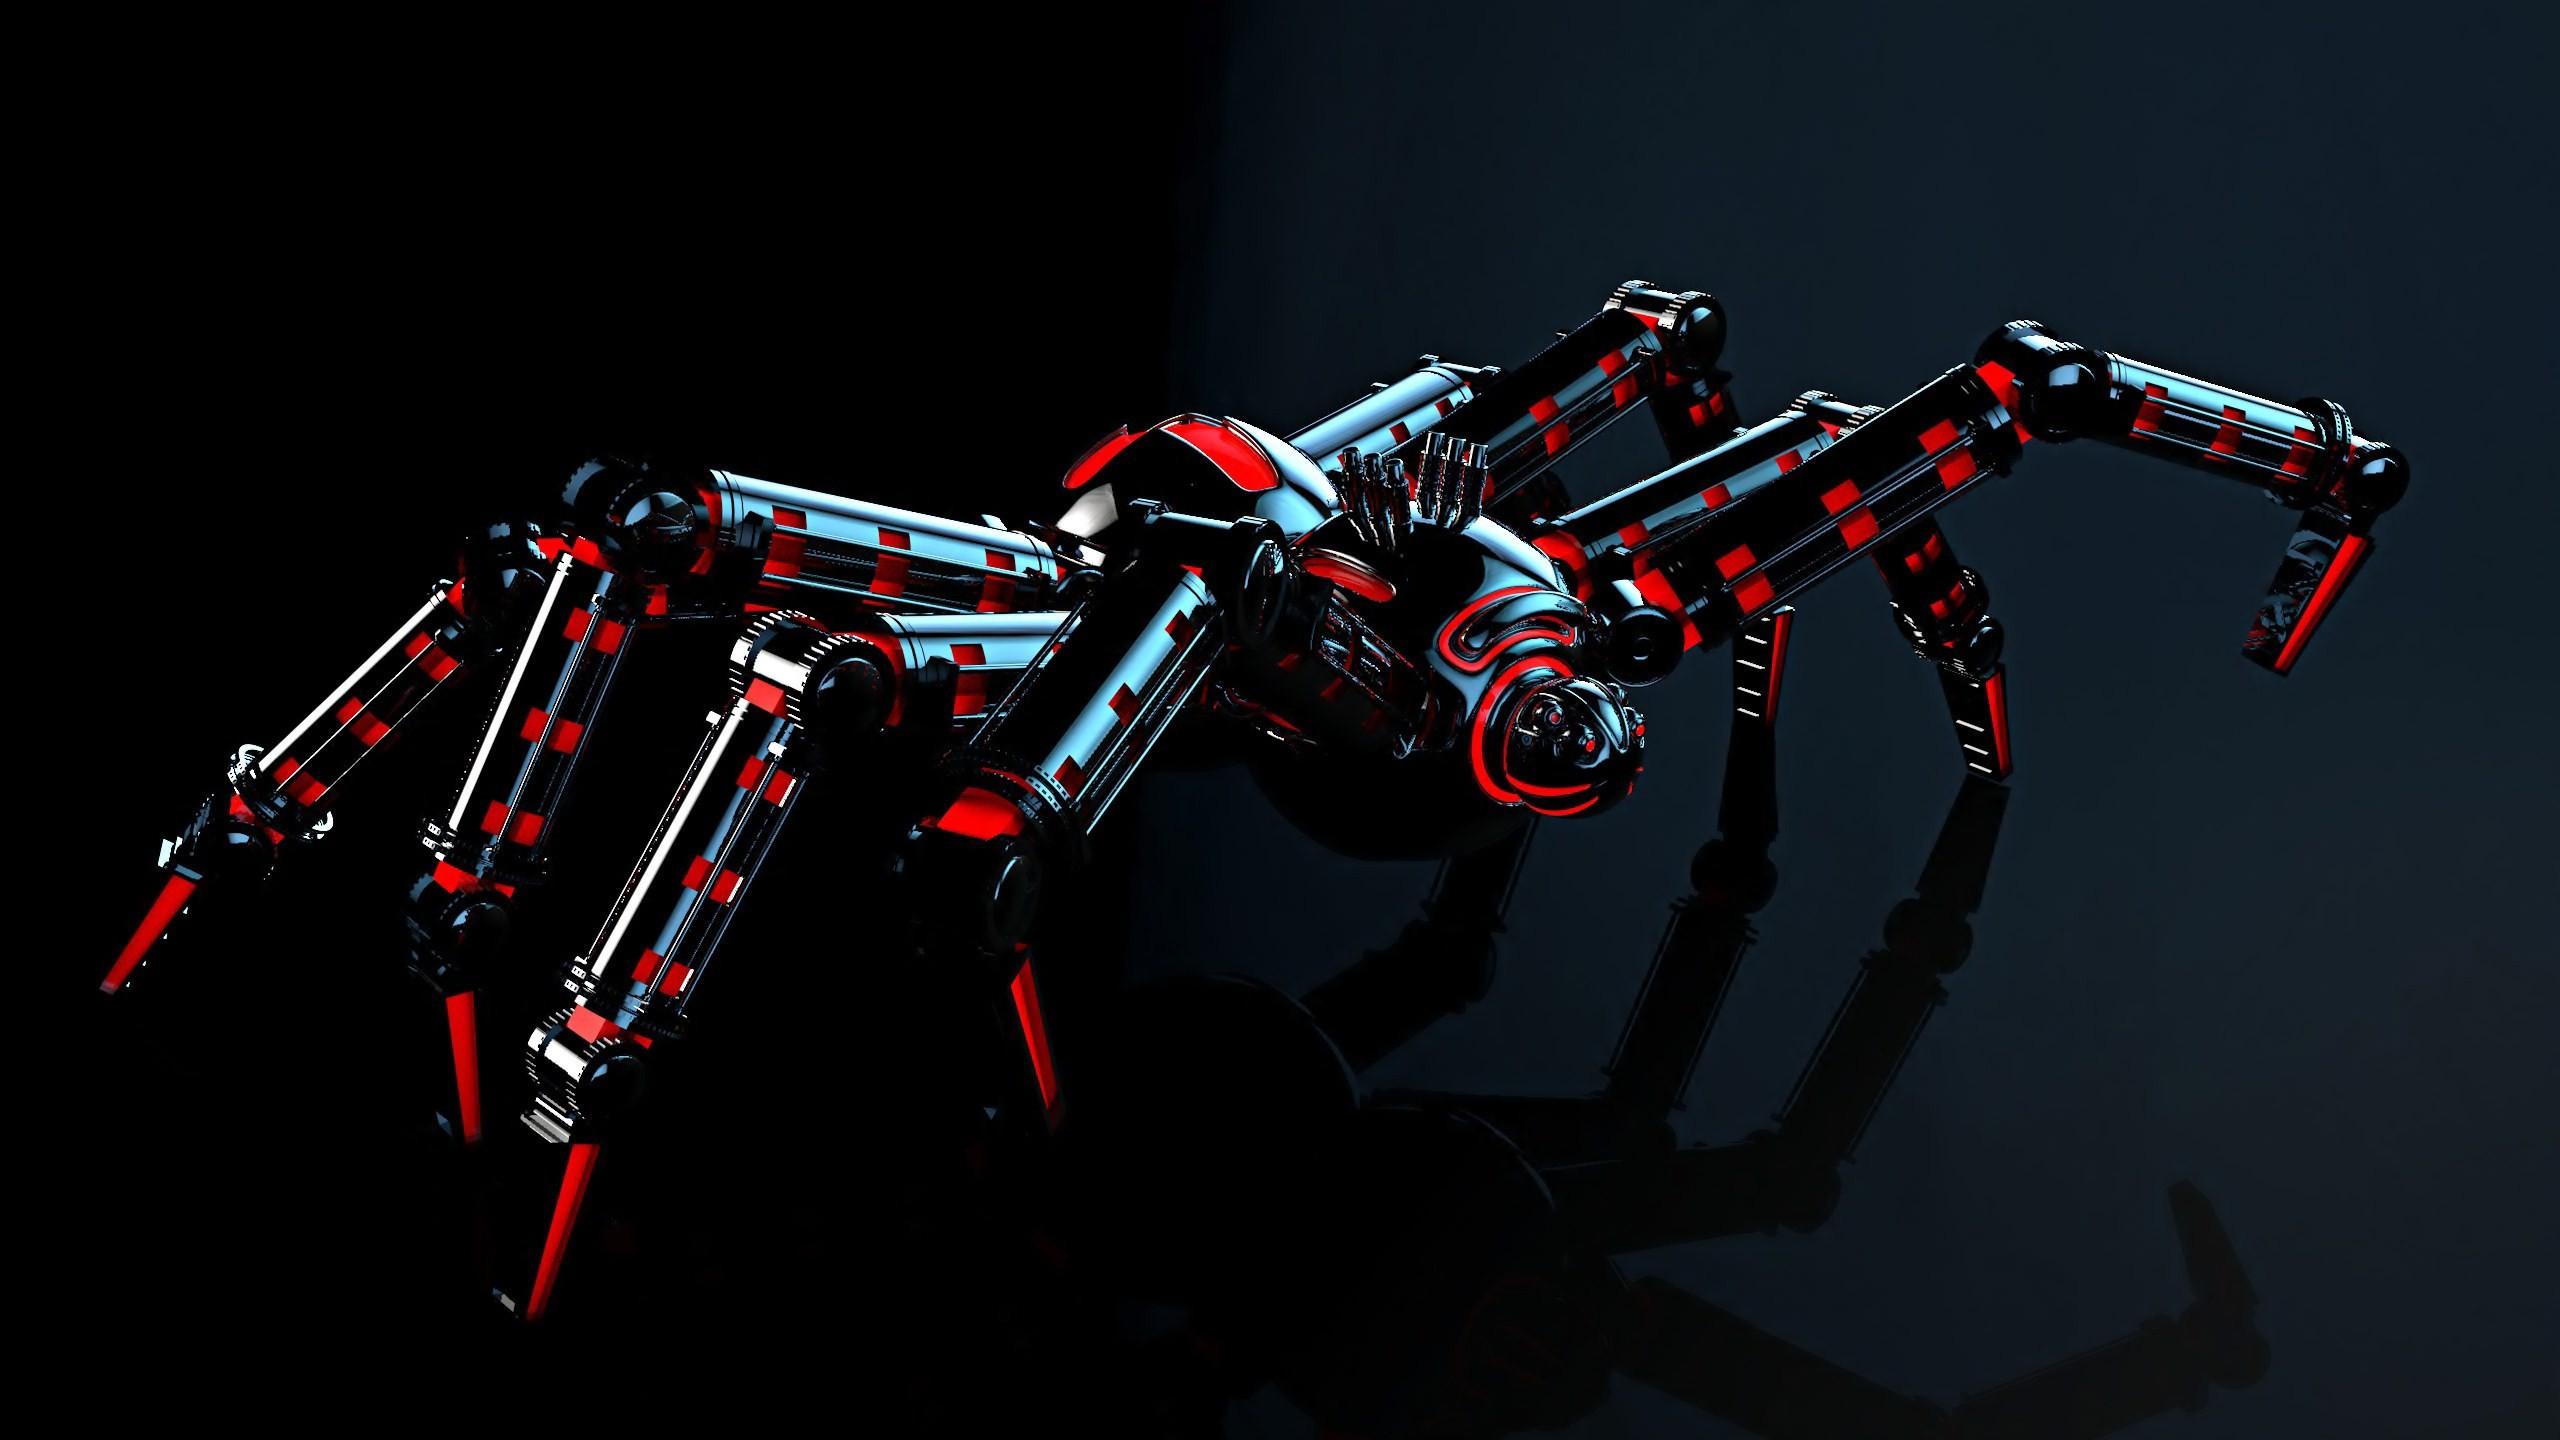 Black Widow Spider Wallpaper Hd wallpaper – 1053037